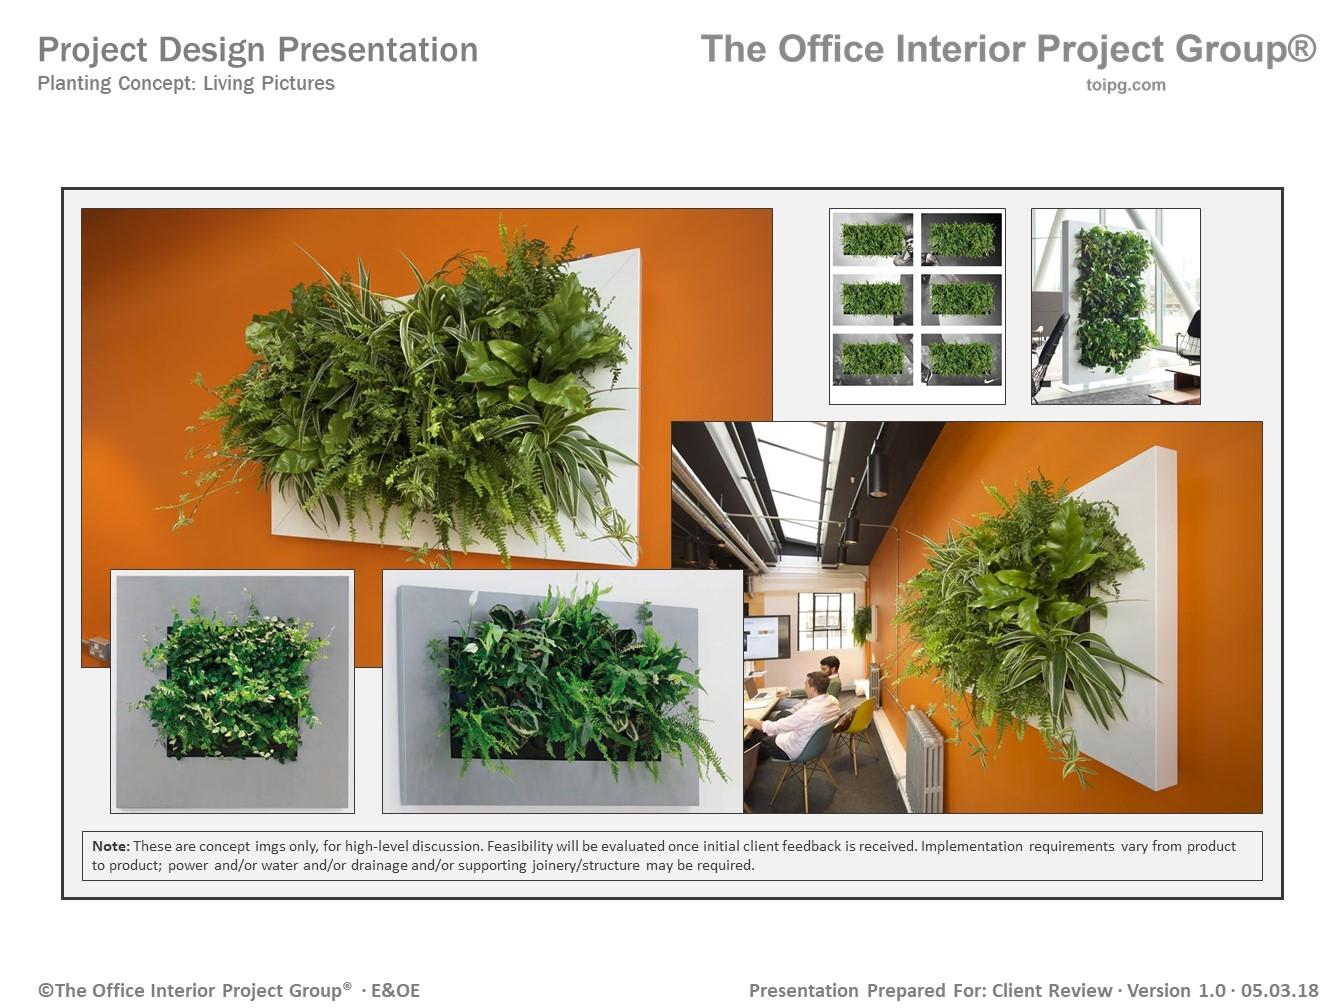 TOIPG® Design Presentation - Planting Concepts - Living Pictures - 05.03.18.jpg